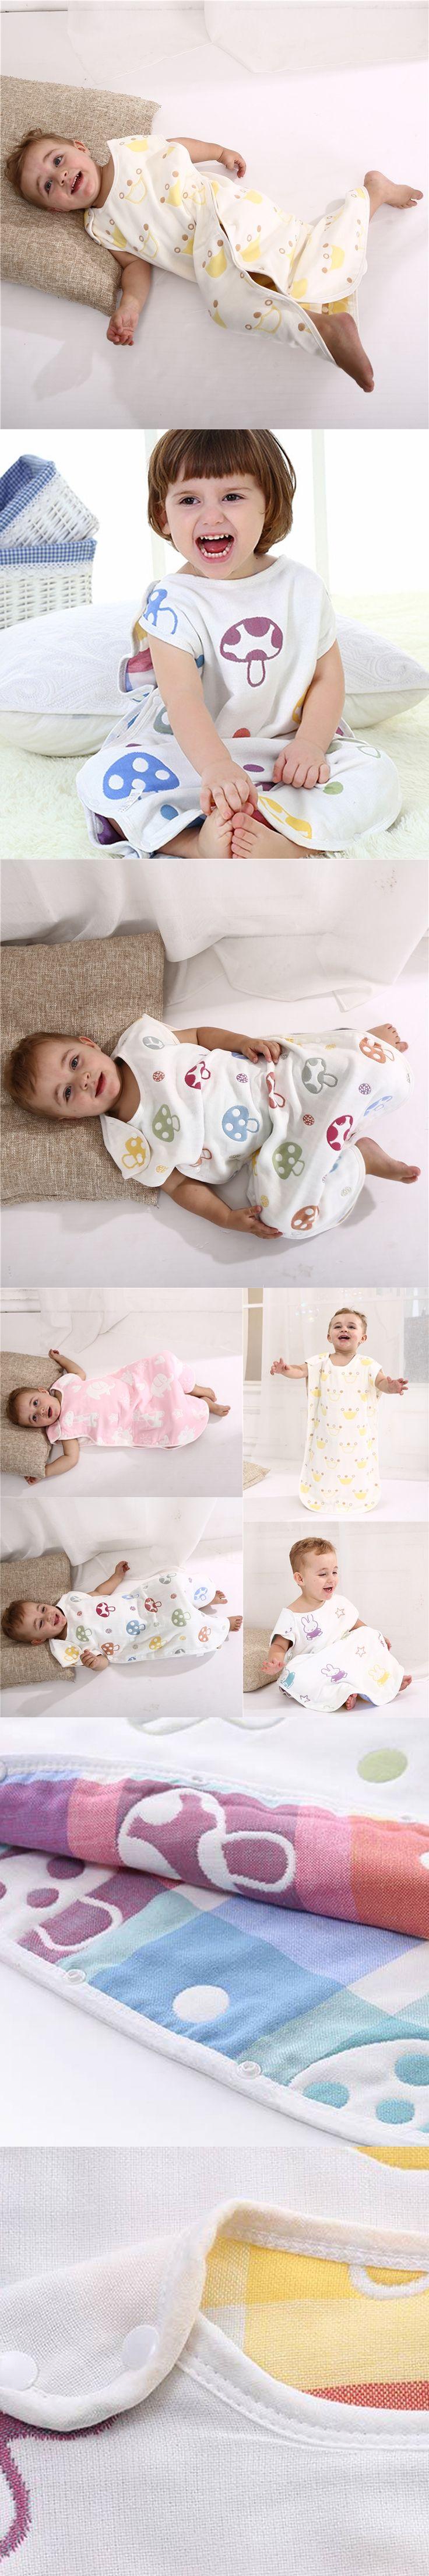 80*45cm BabySack Cotton Summer Baby Thin Toddler Sleeping Bag Summer Kids Newborns Sleepsack Saco De Dormir Para Bebe turbulette